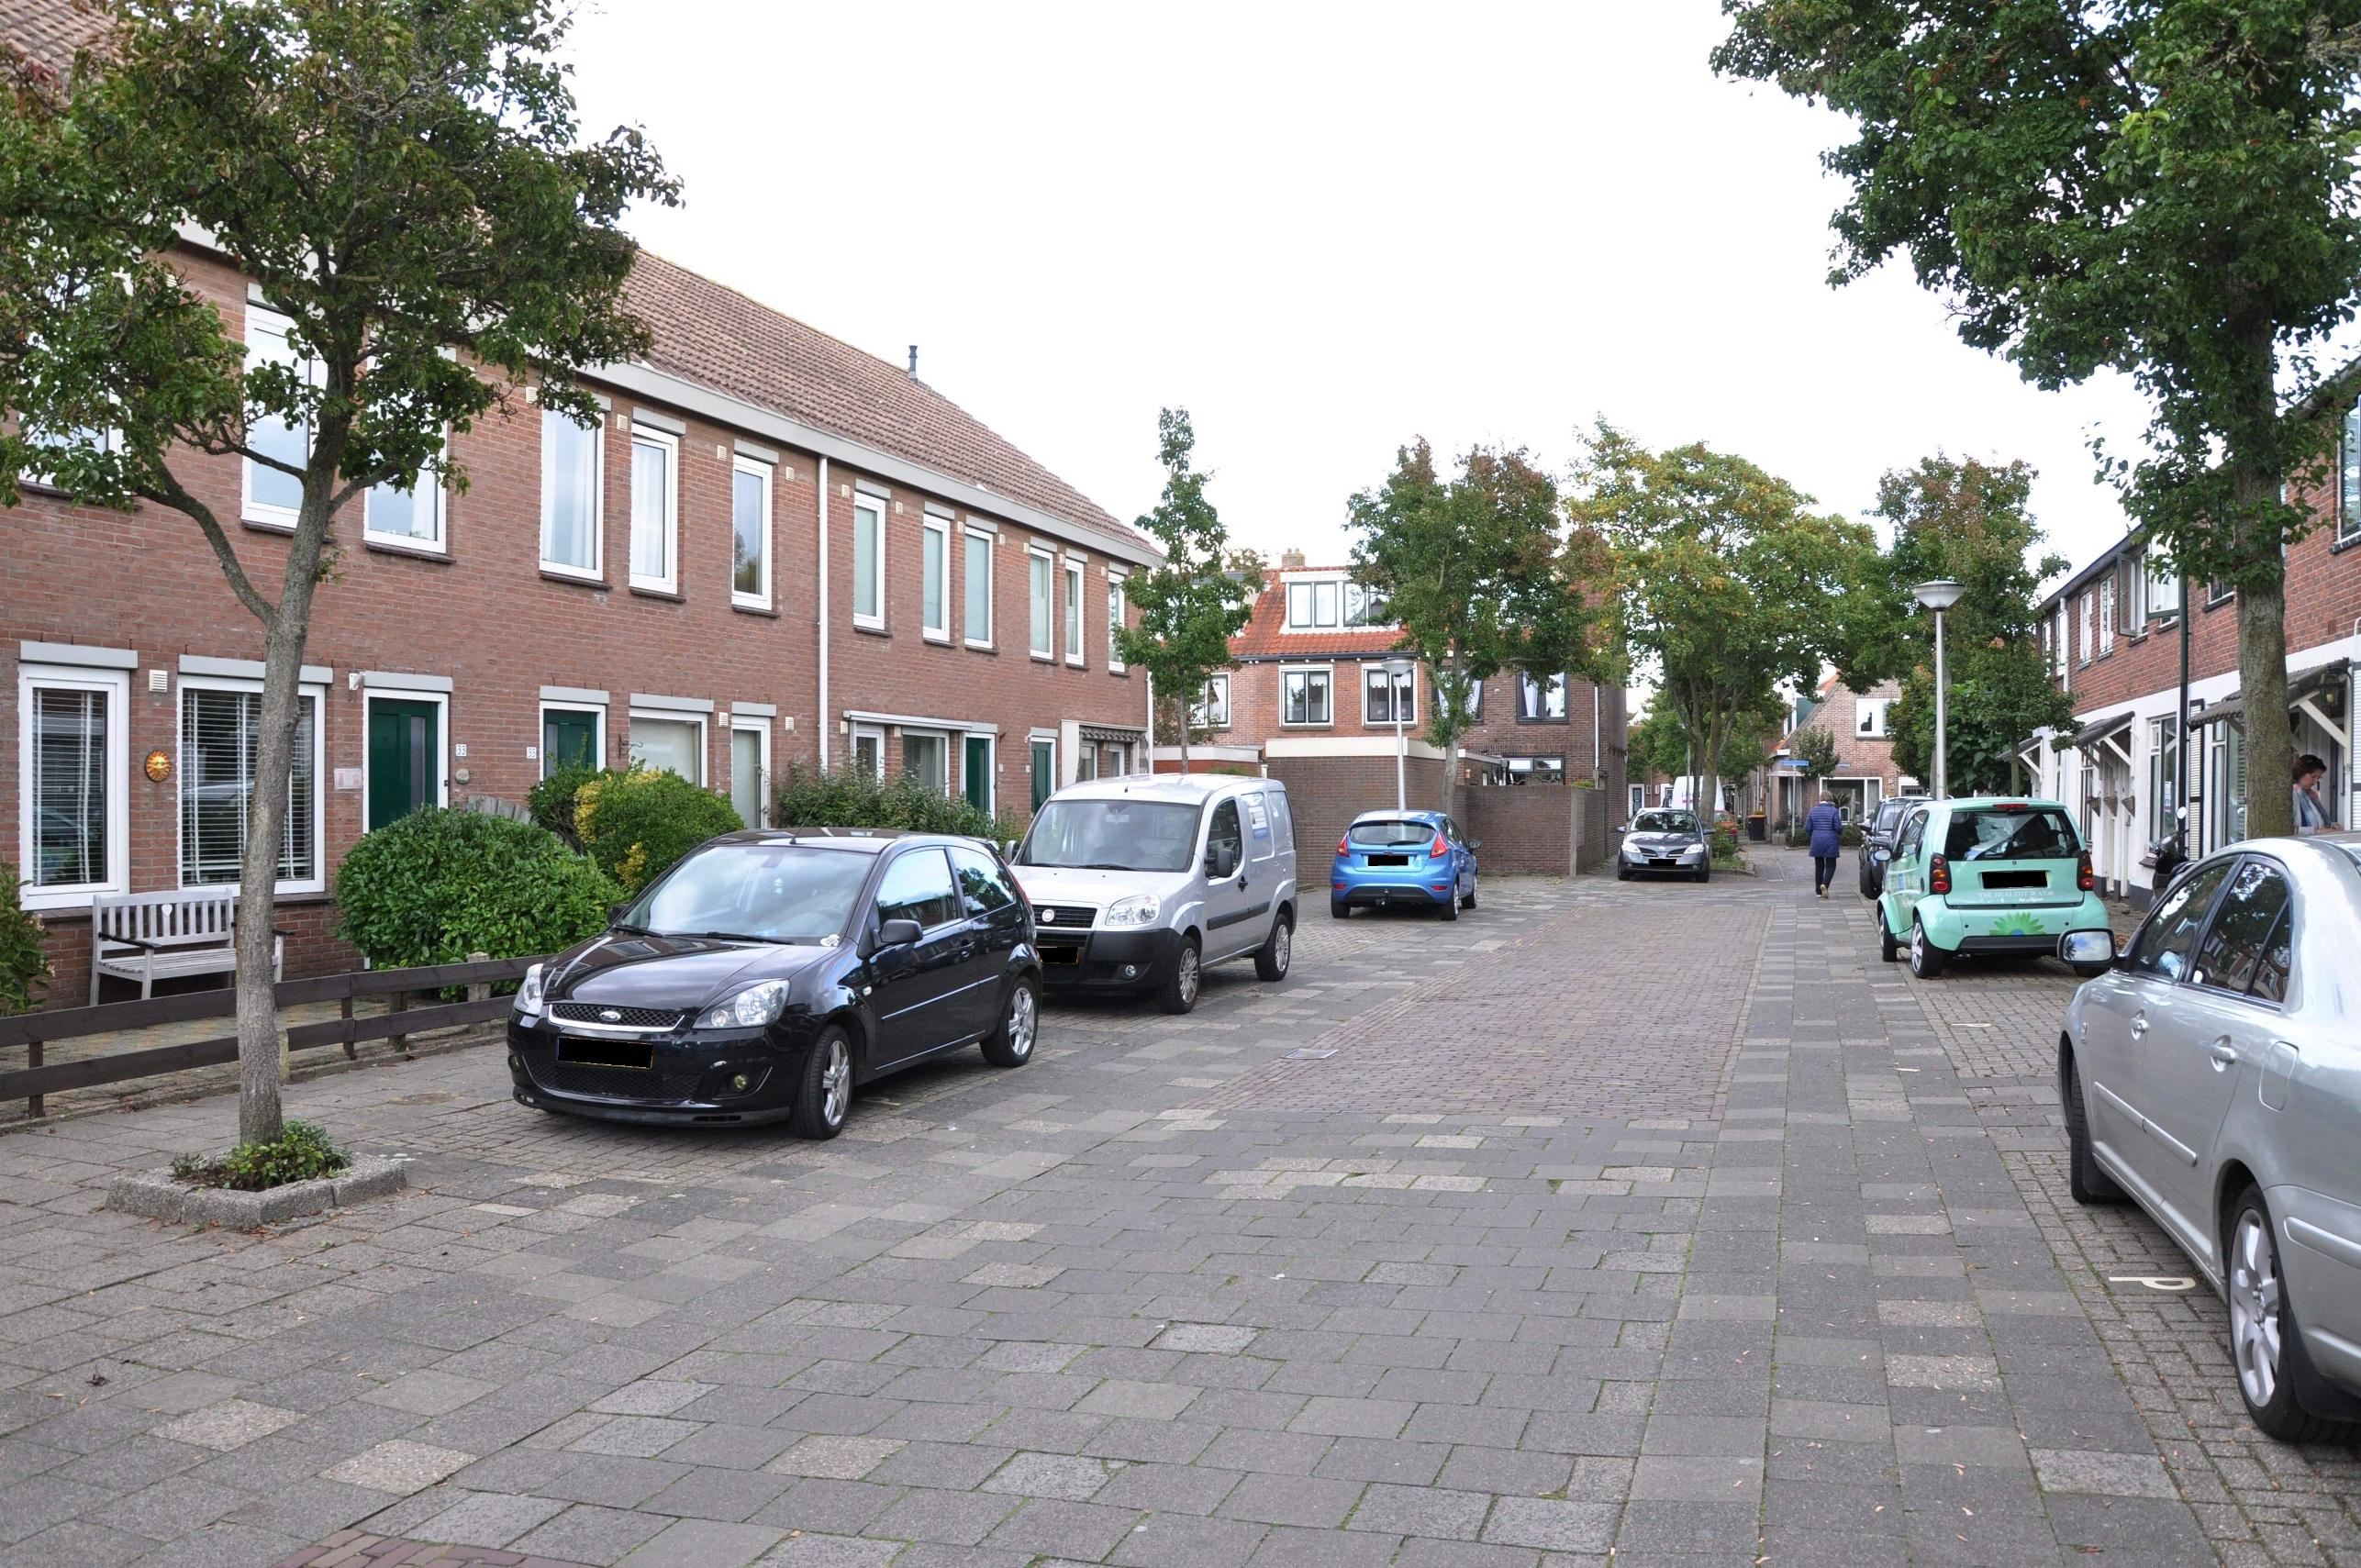 Vreewijk, Lisse